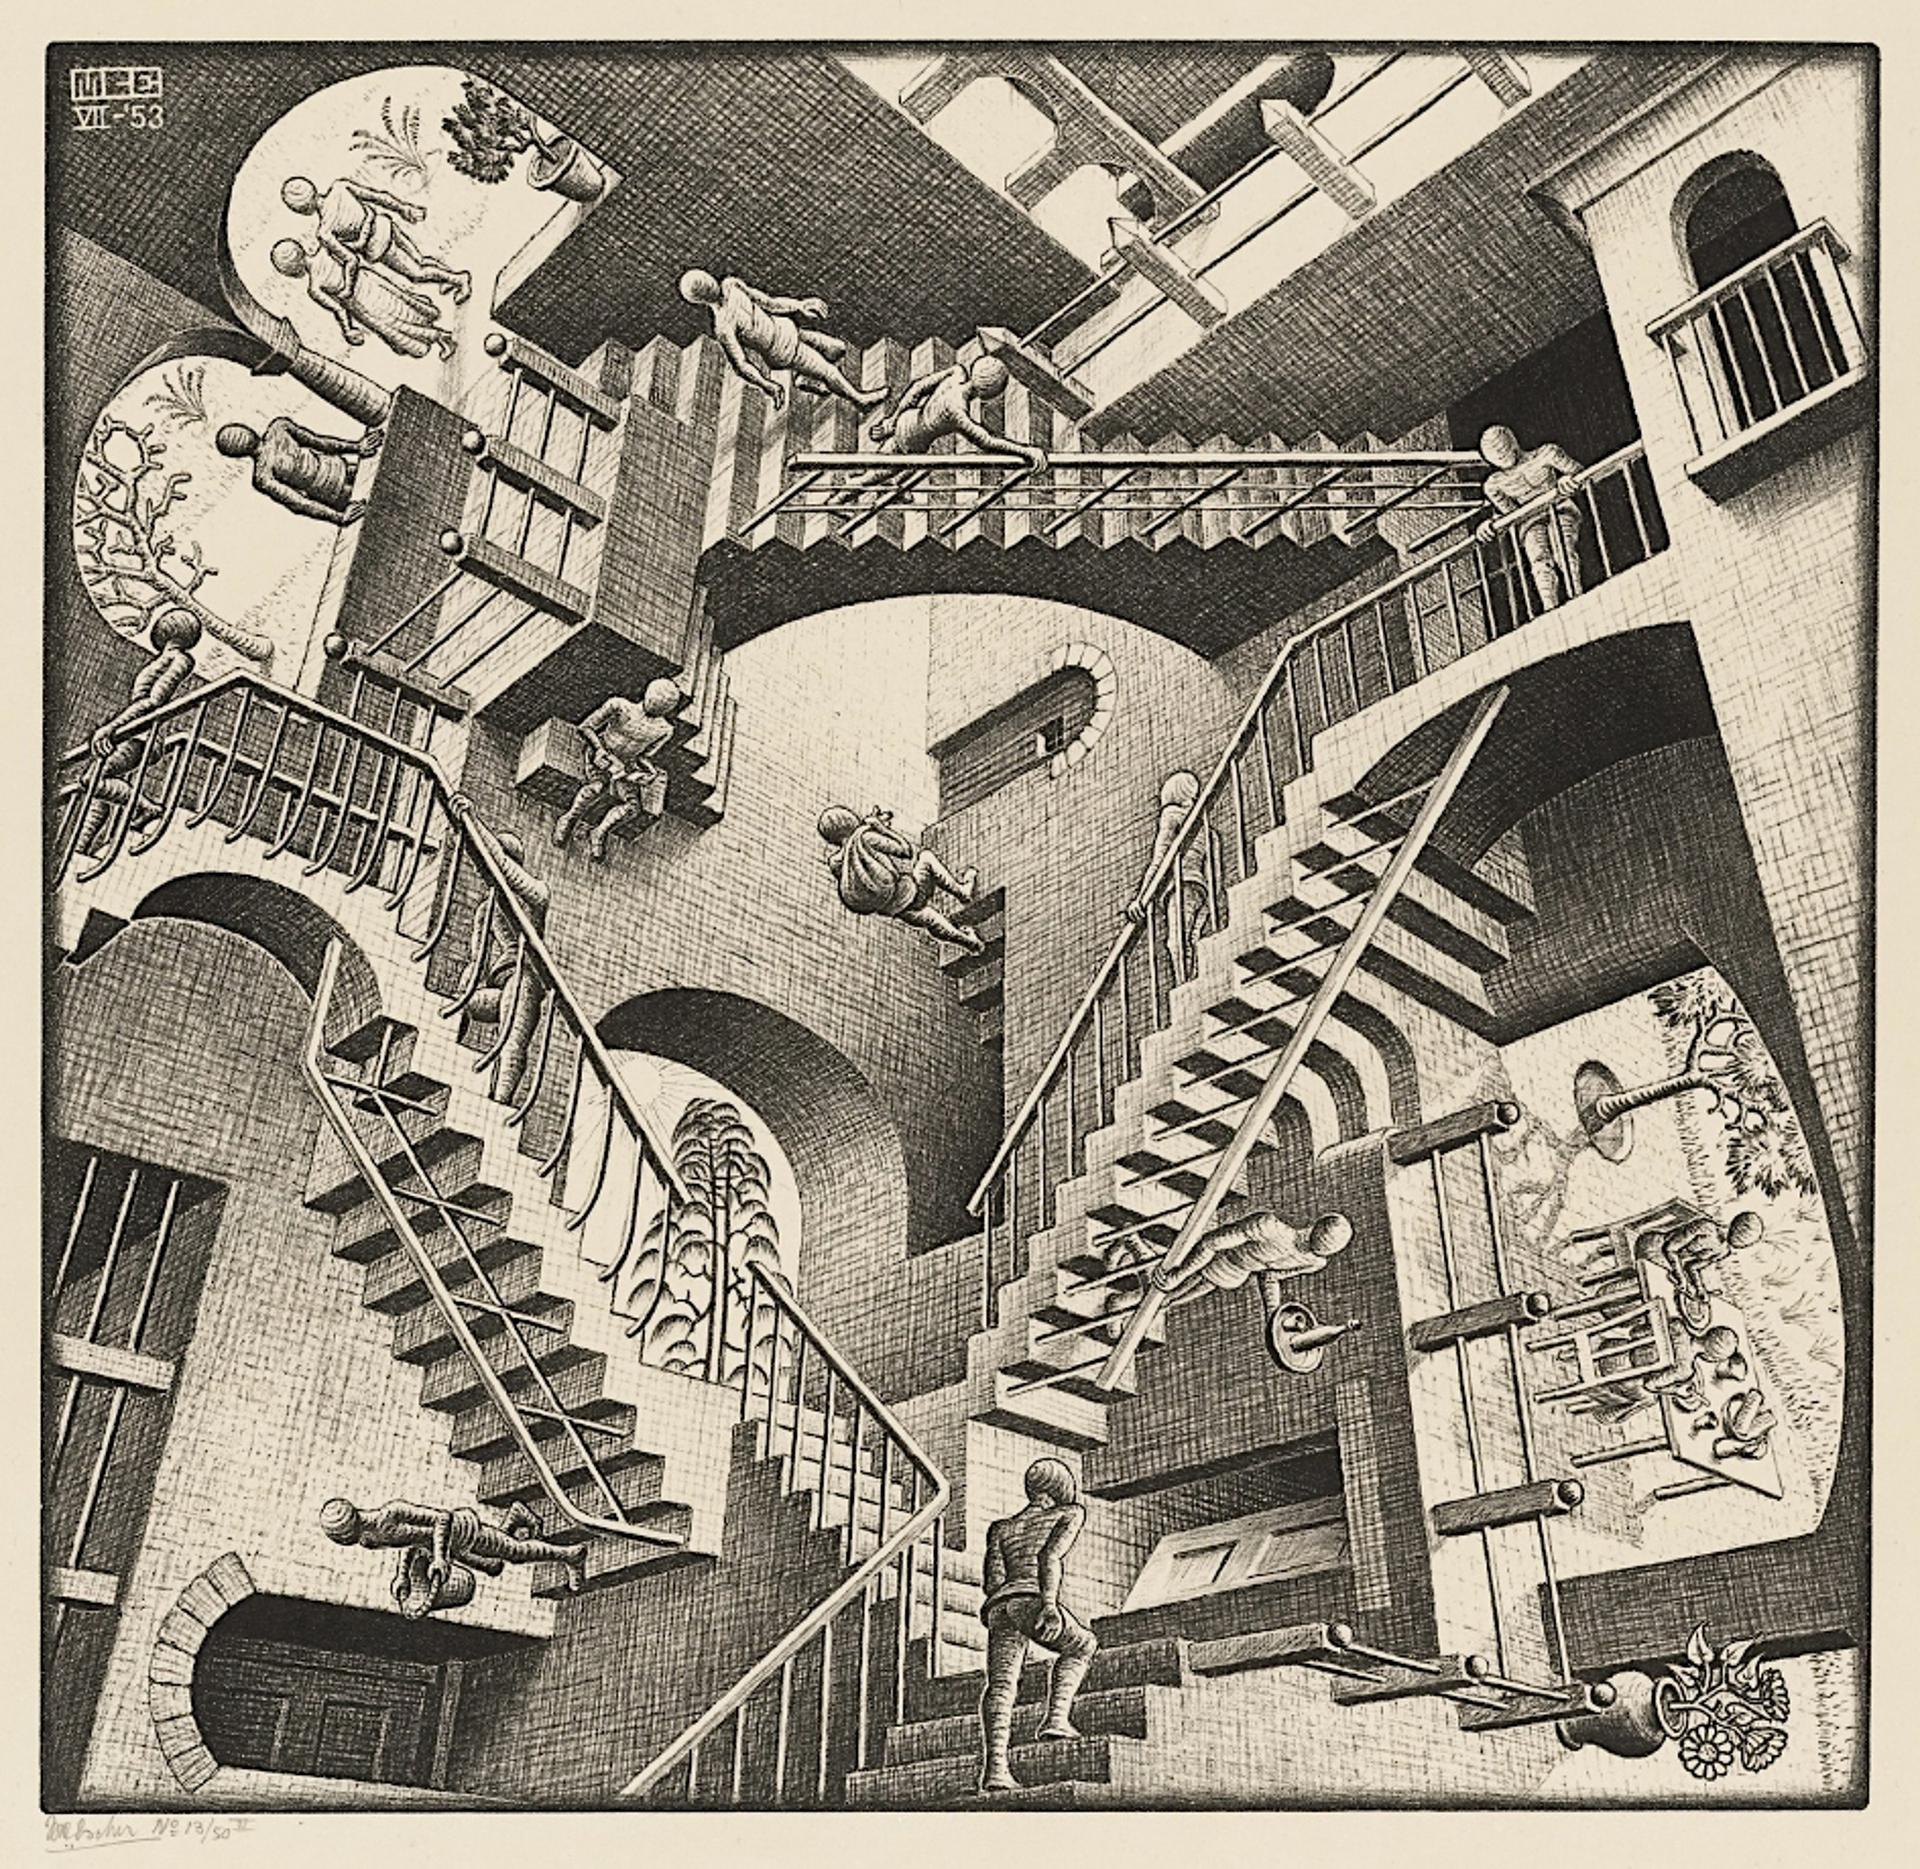 Relativity by M.C. Escher